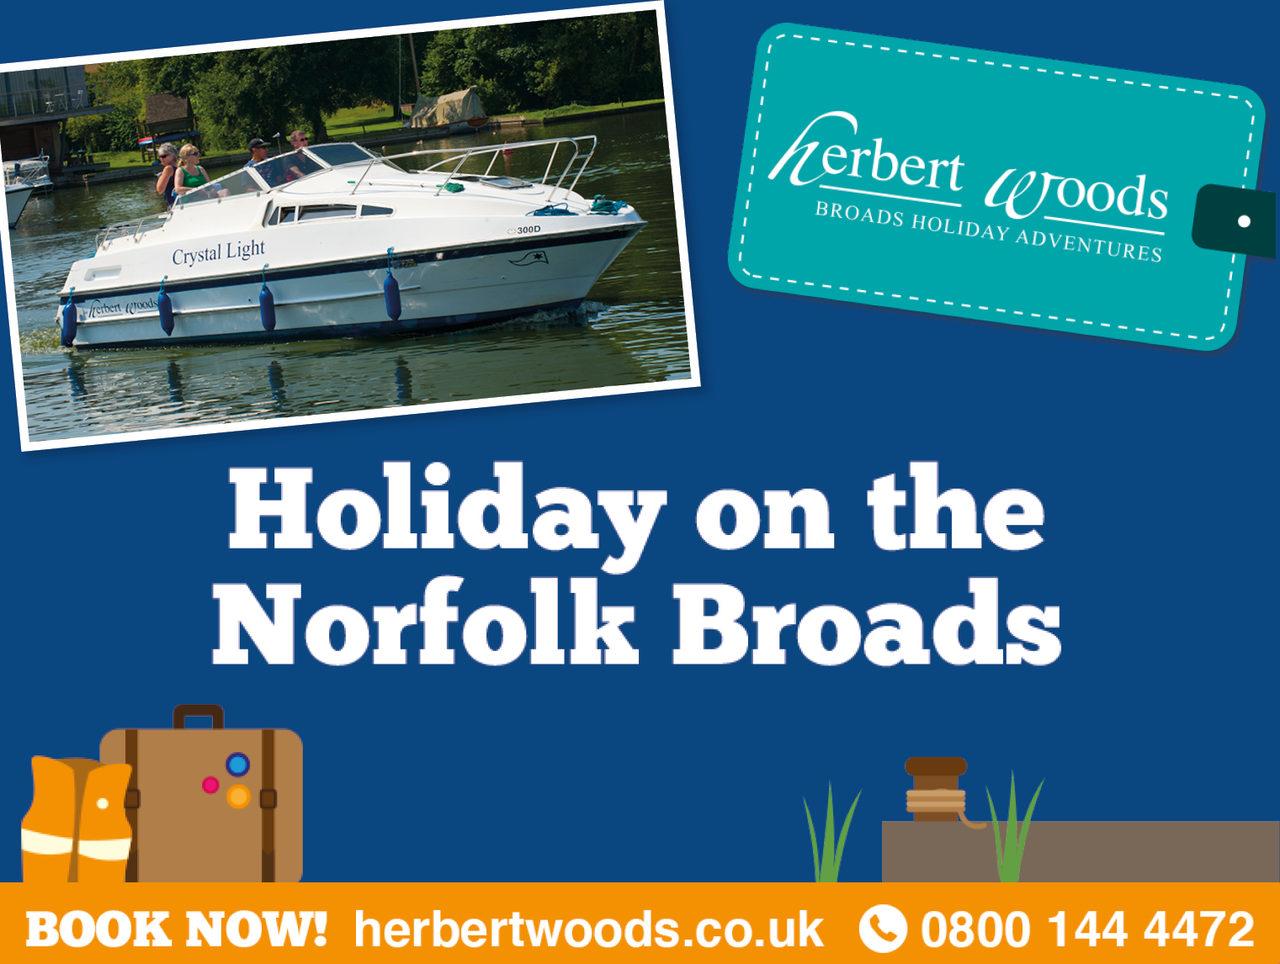 Herbert Woods Broads Holidays